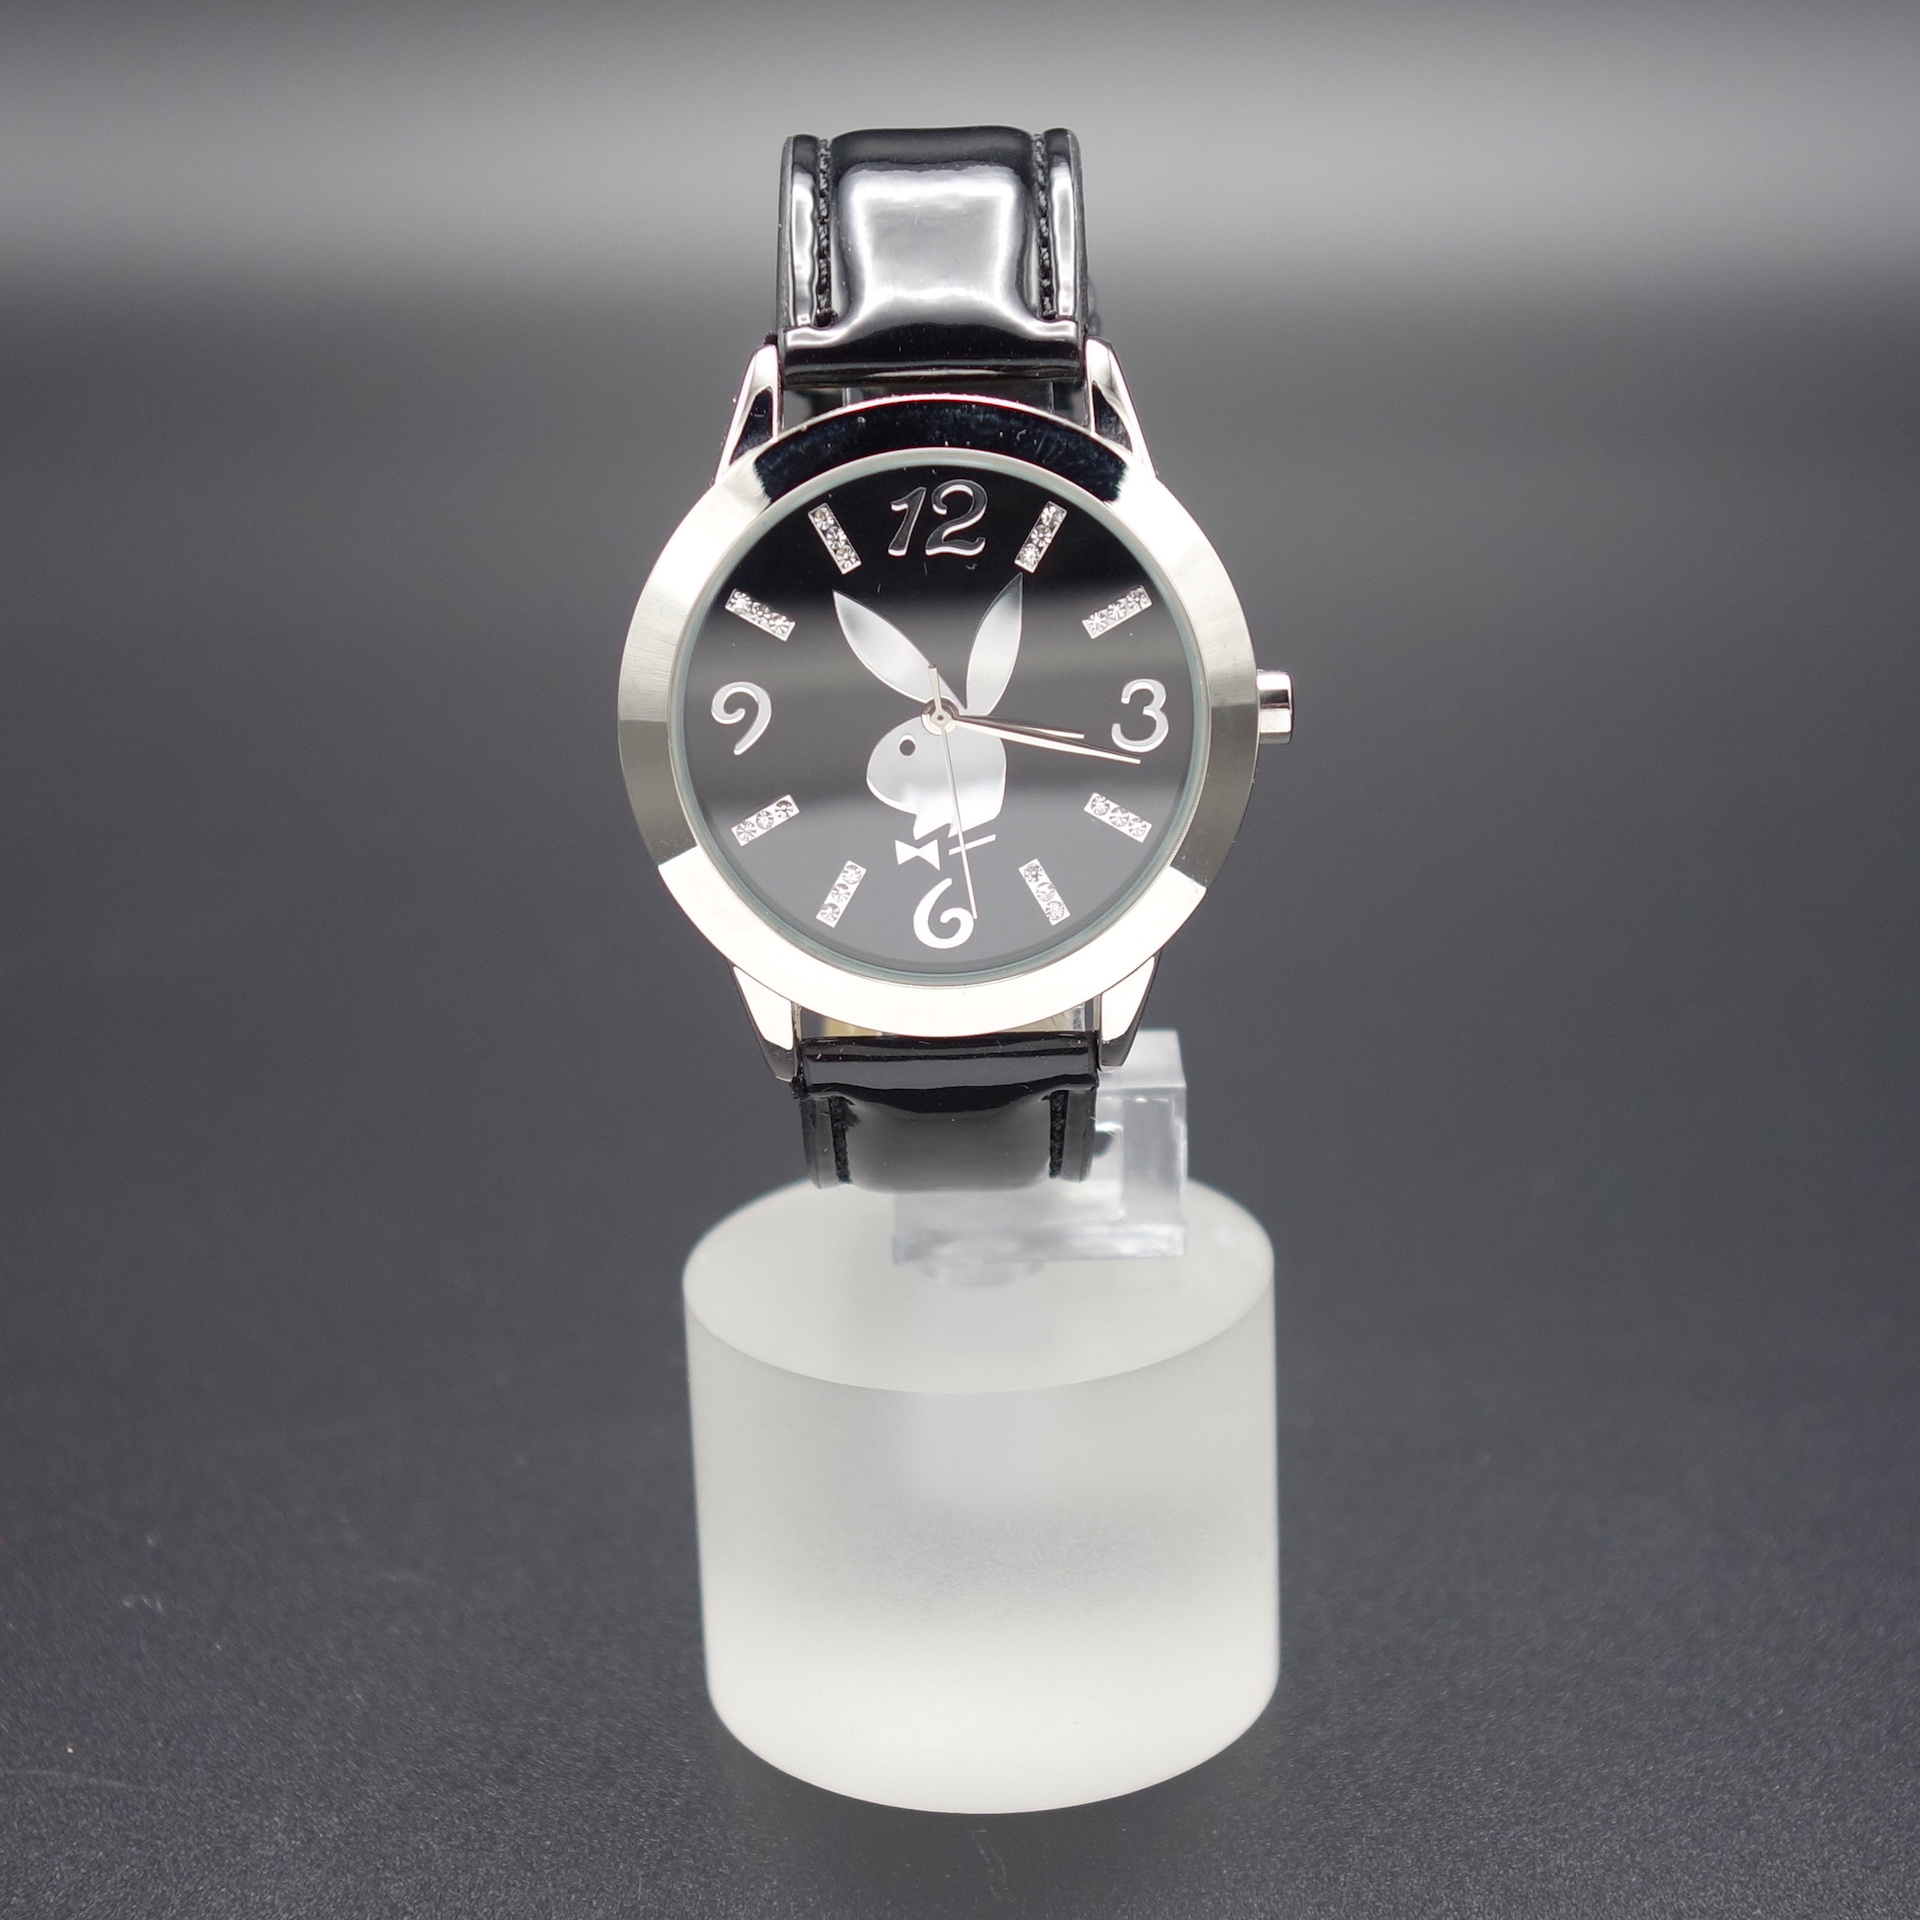 Playboy Damen Armbanduhr PBH0501BKBK